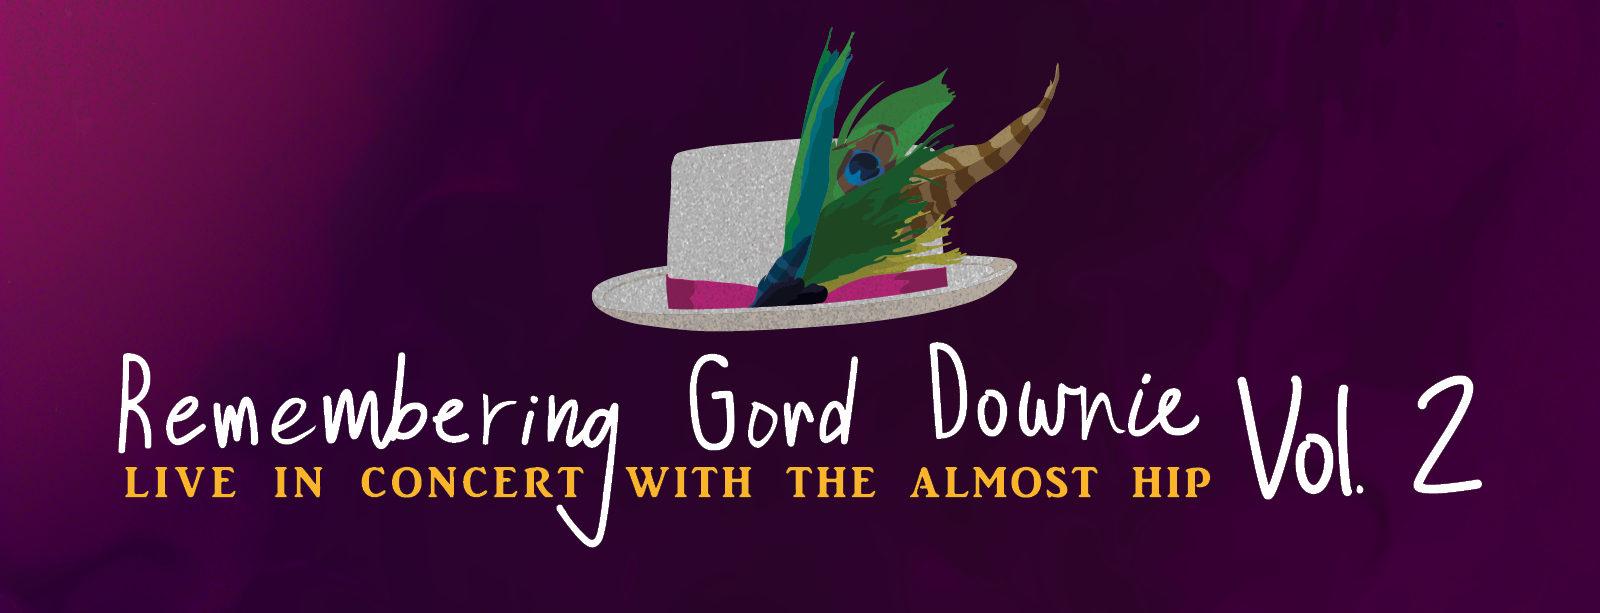 REMEMBERING GORD DOWNIE VOL 2